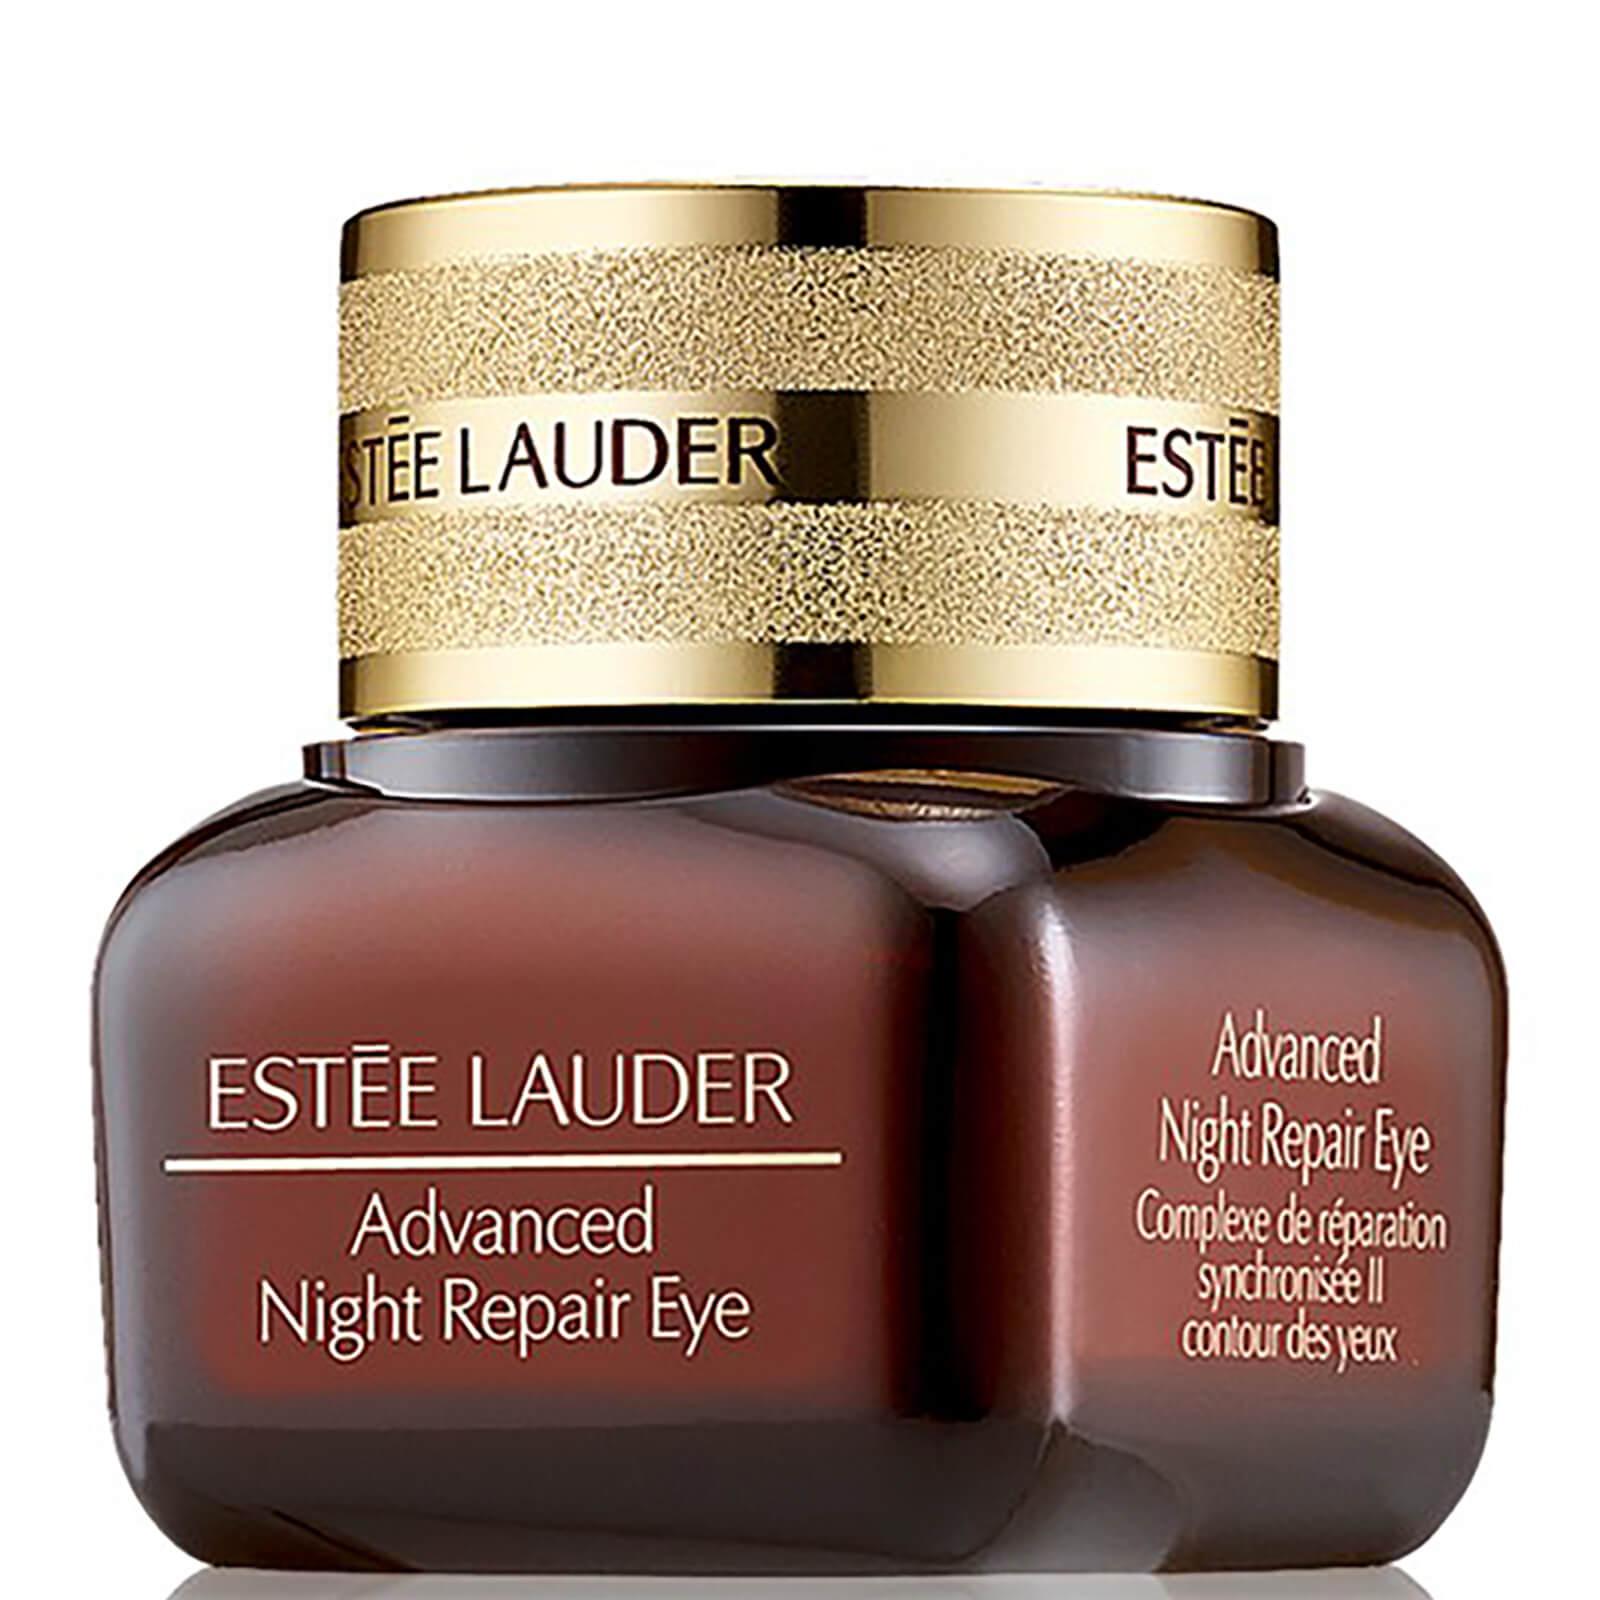 Estee Lauder Advanced Night Repair Eye Synchronized Complex Ii 15ml Lookfantastic